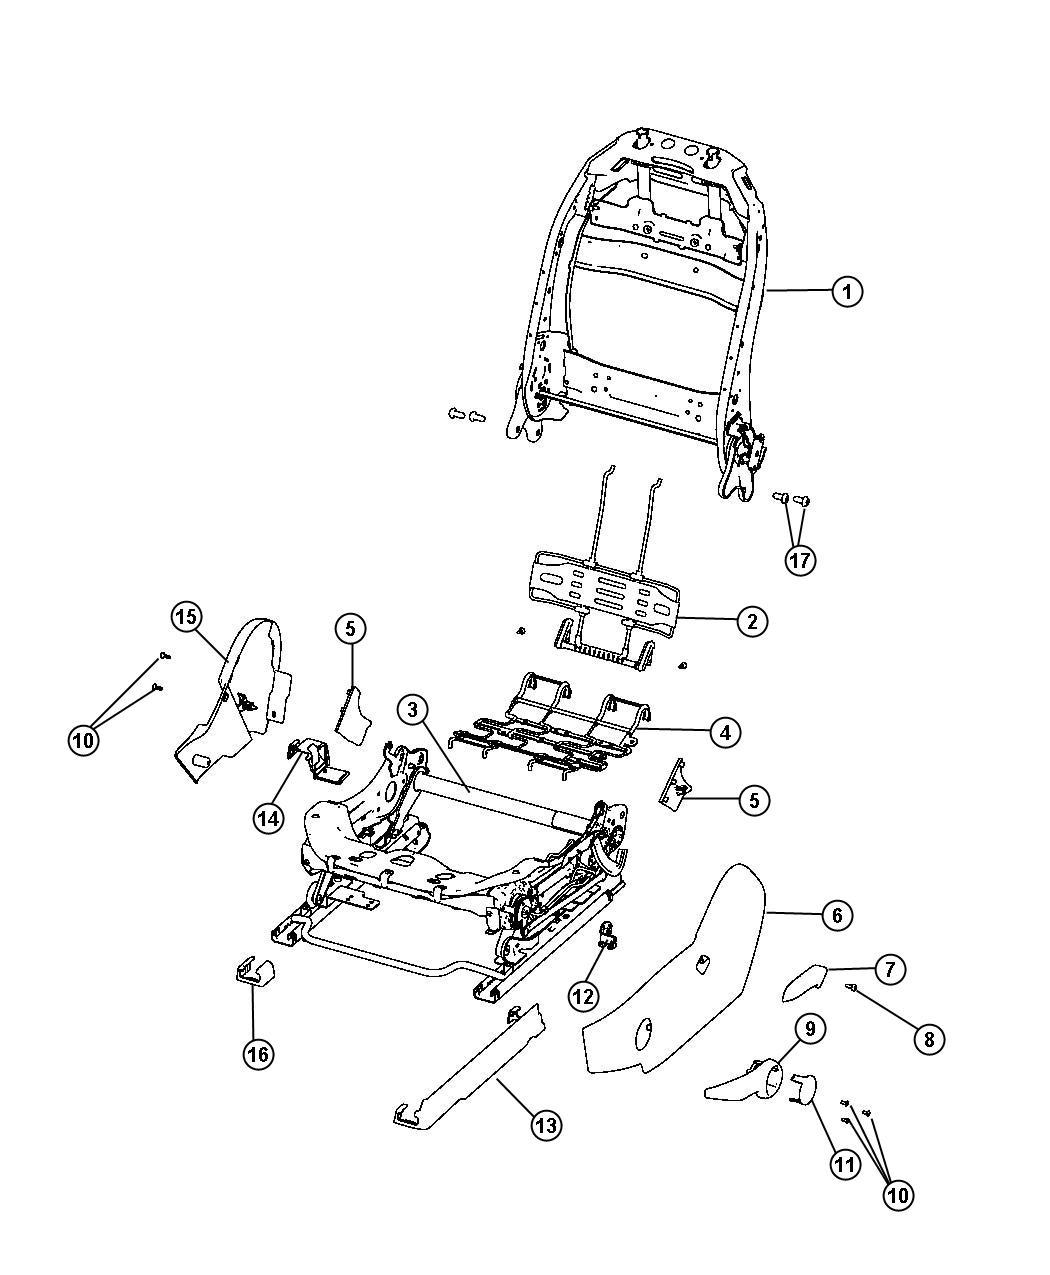 2012 Dodge Dart Shield Driver Outboard Trim Cloth Low